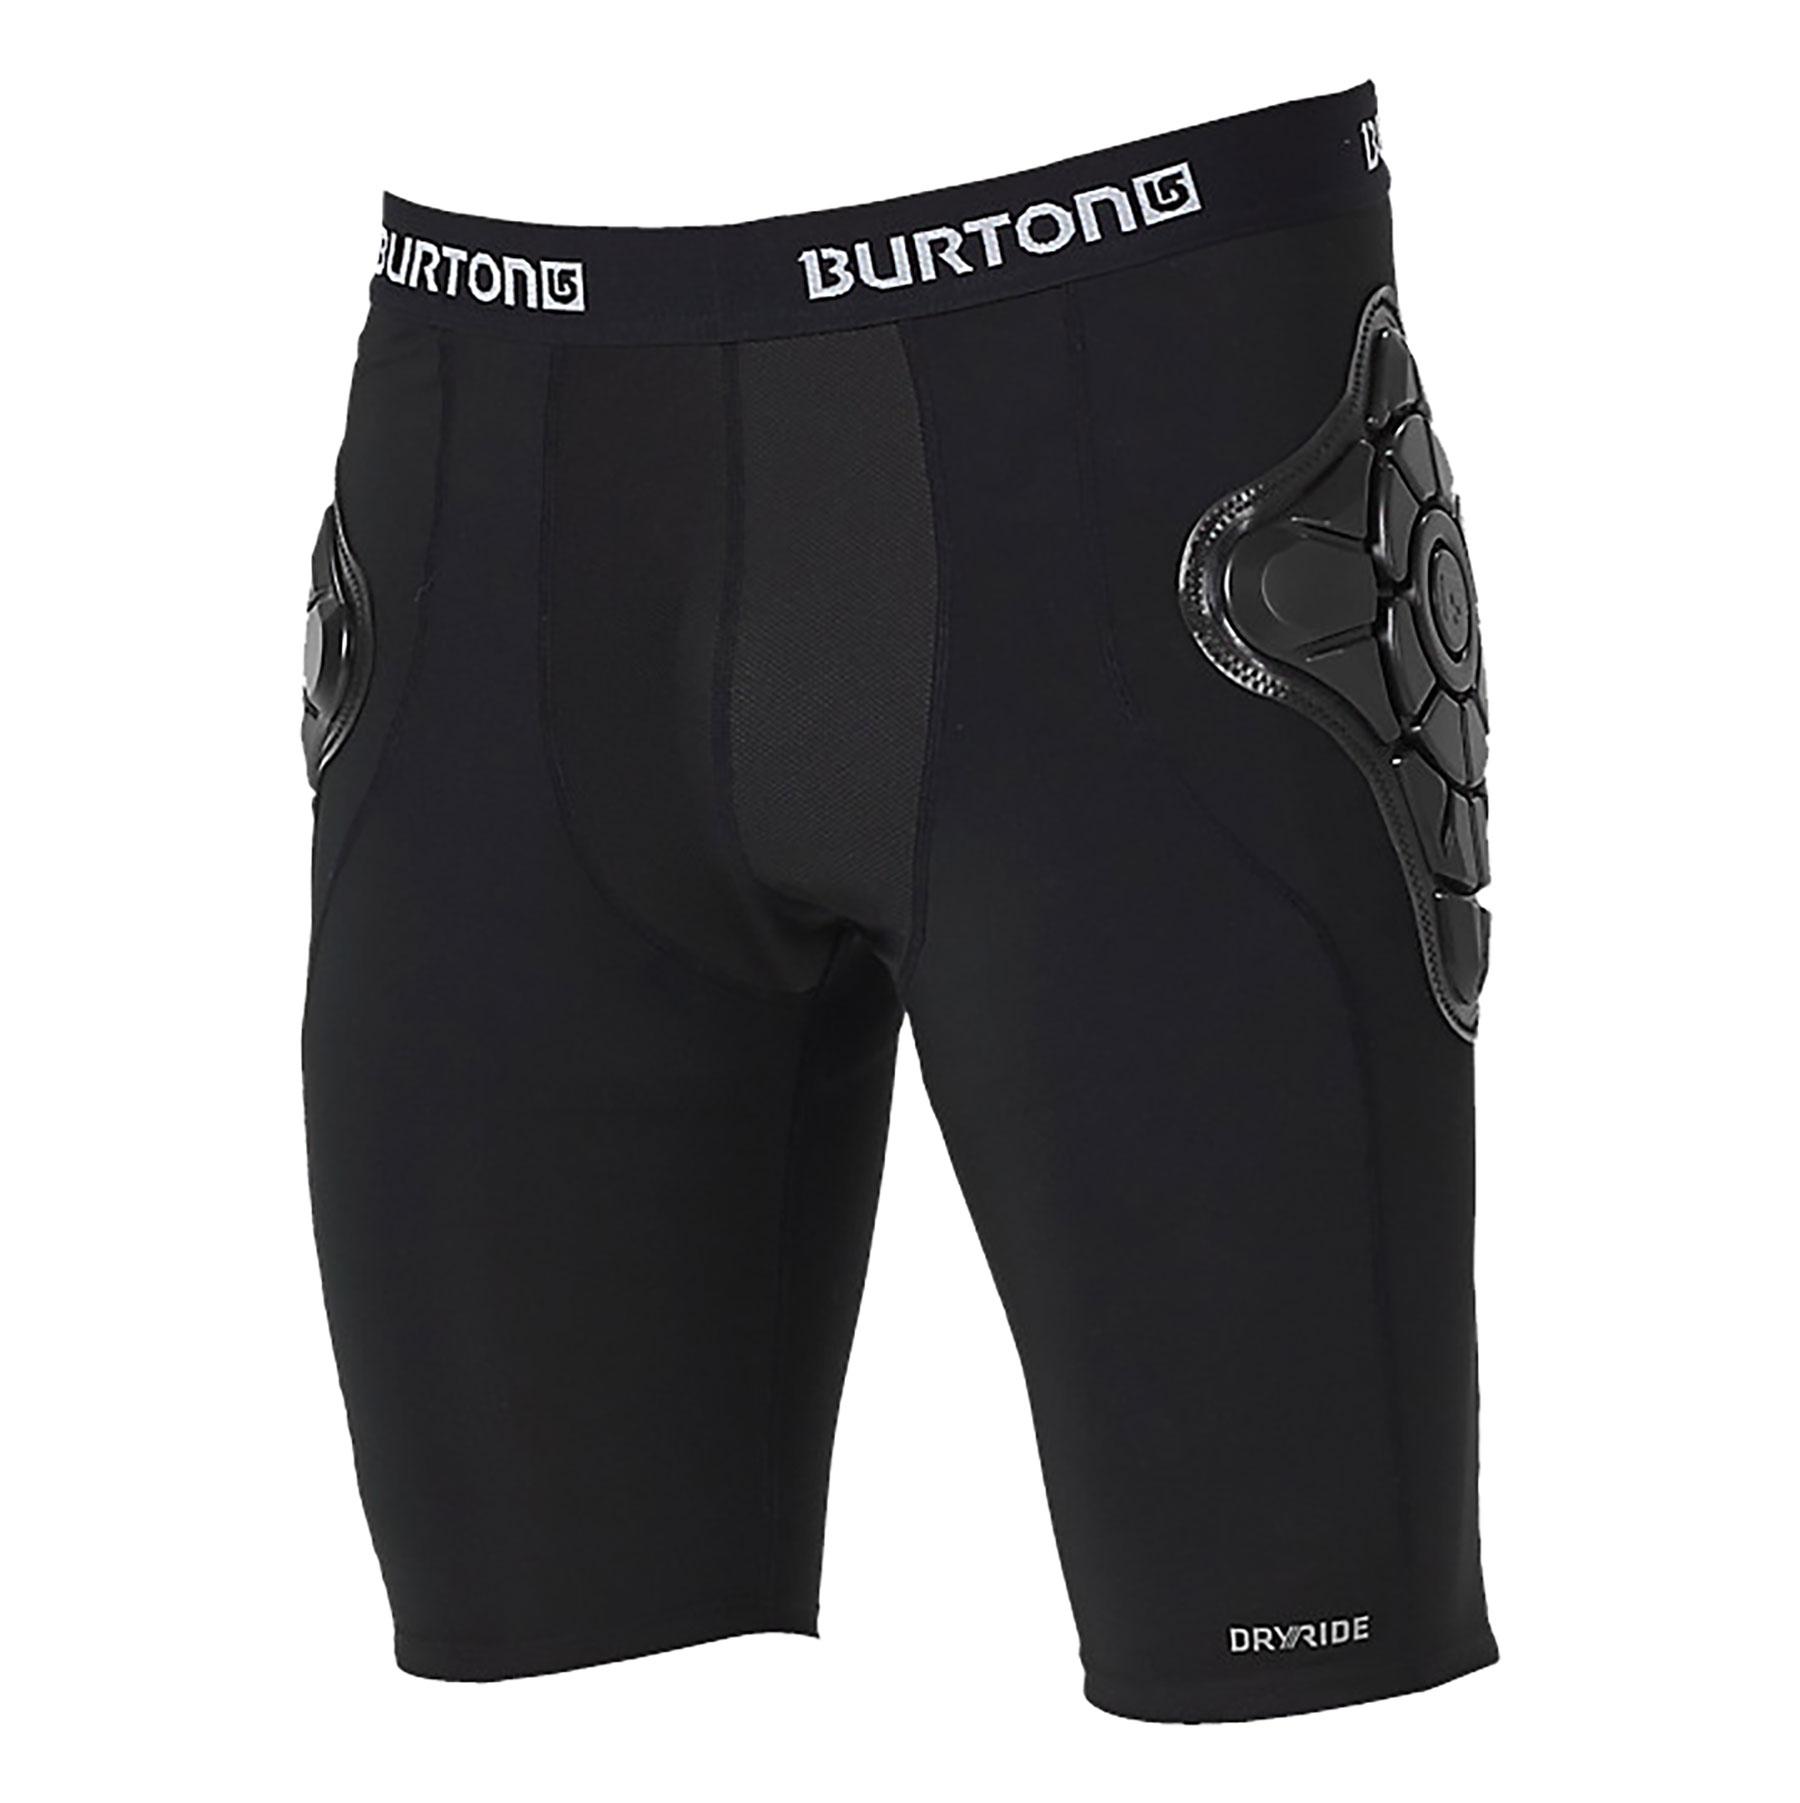 Prezzi Burton Pantaloncini total impact